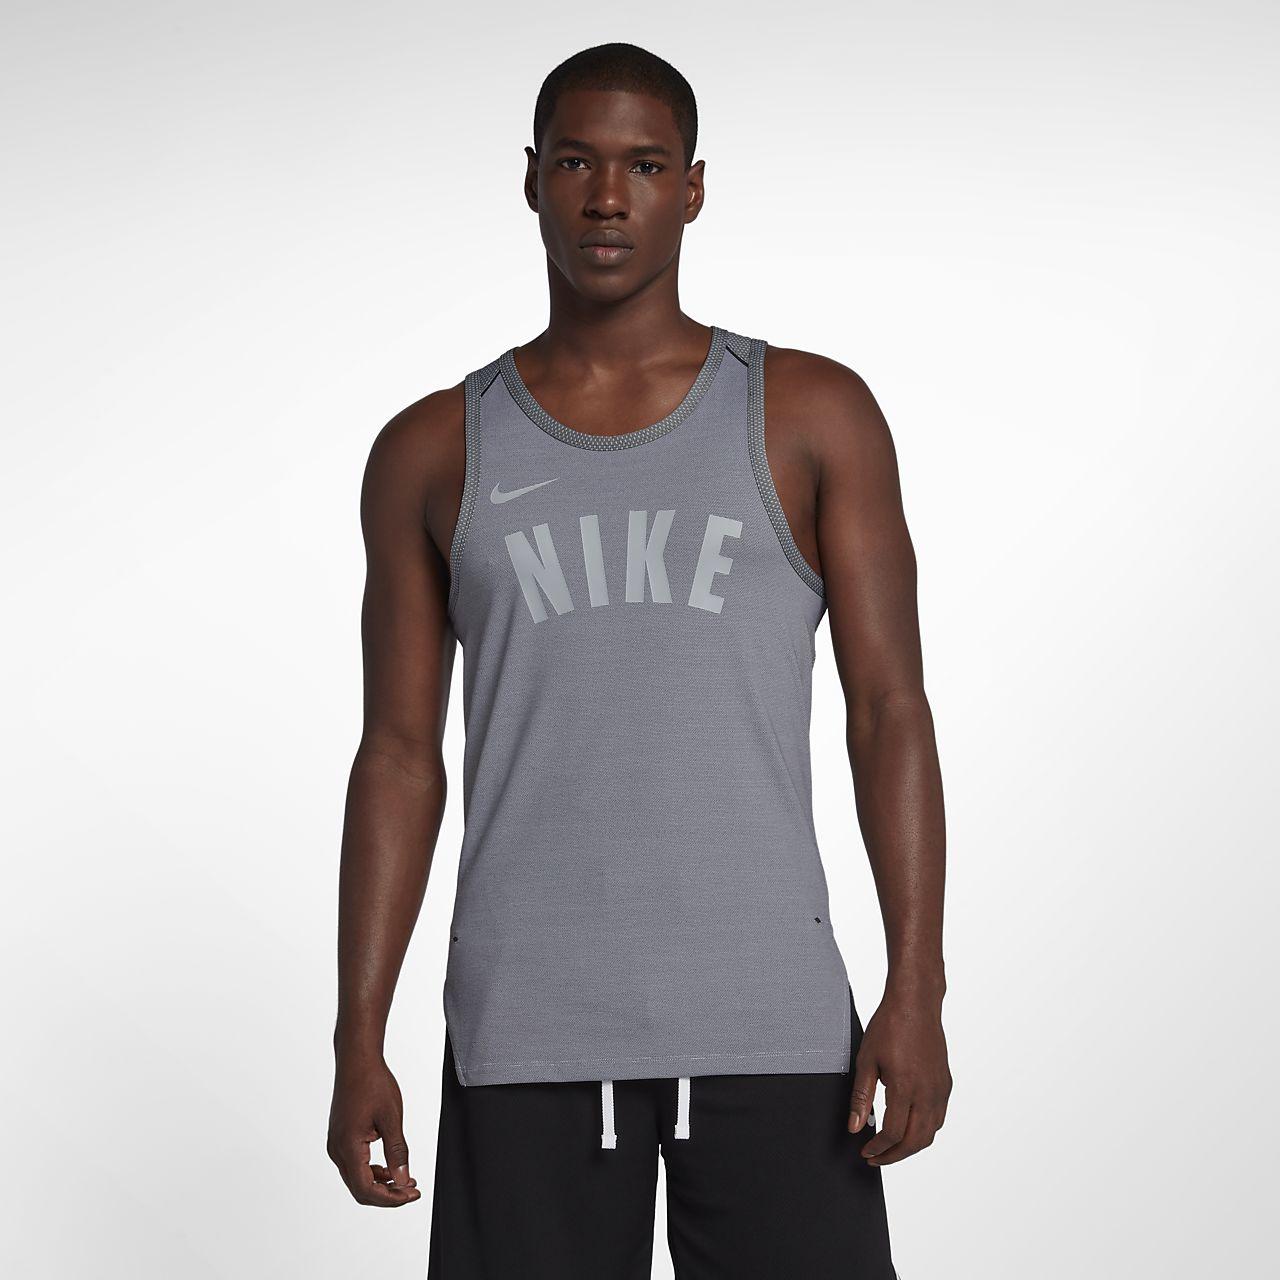 dda9625fbfd29 Top de básquetbol sin mangas para hombre Nike Dri-FIT Hyper Elite ...